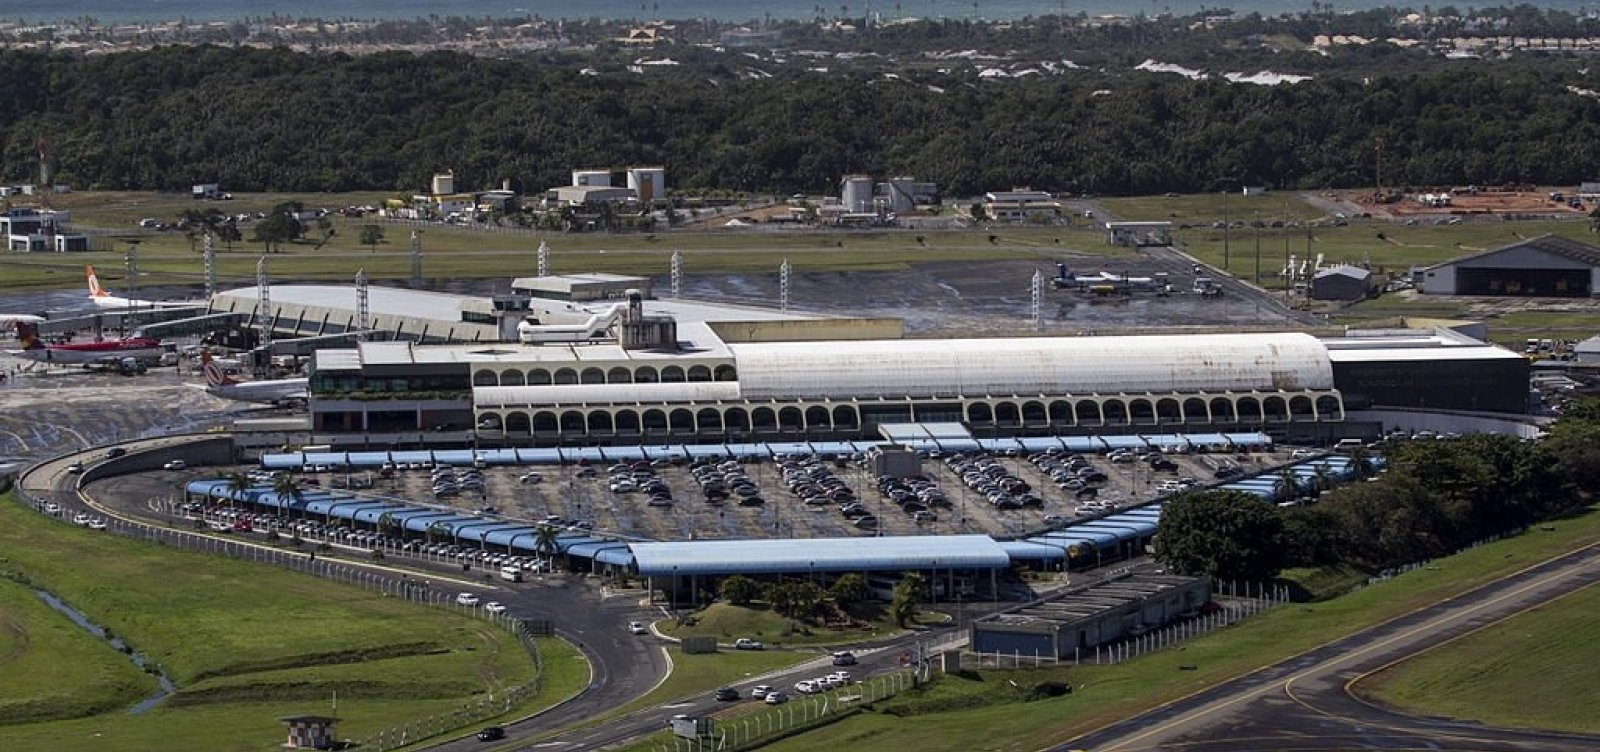 [Pista principal do Aeroporto de Salvador volta a funcionar]